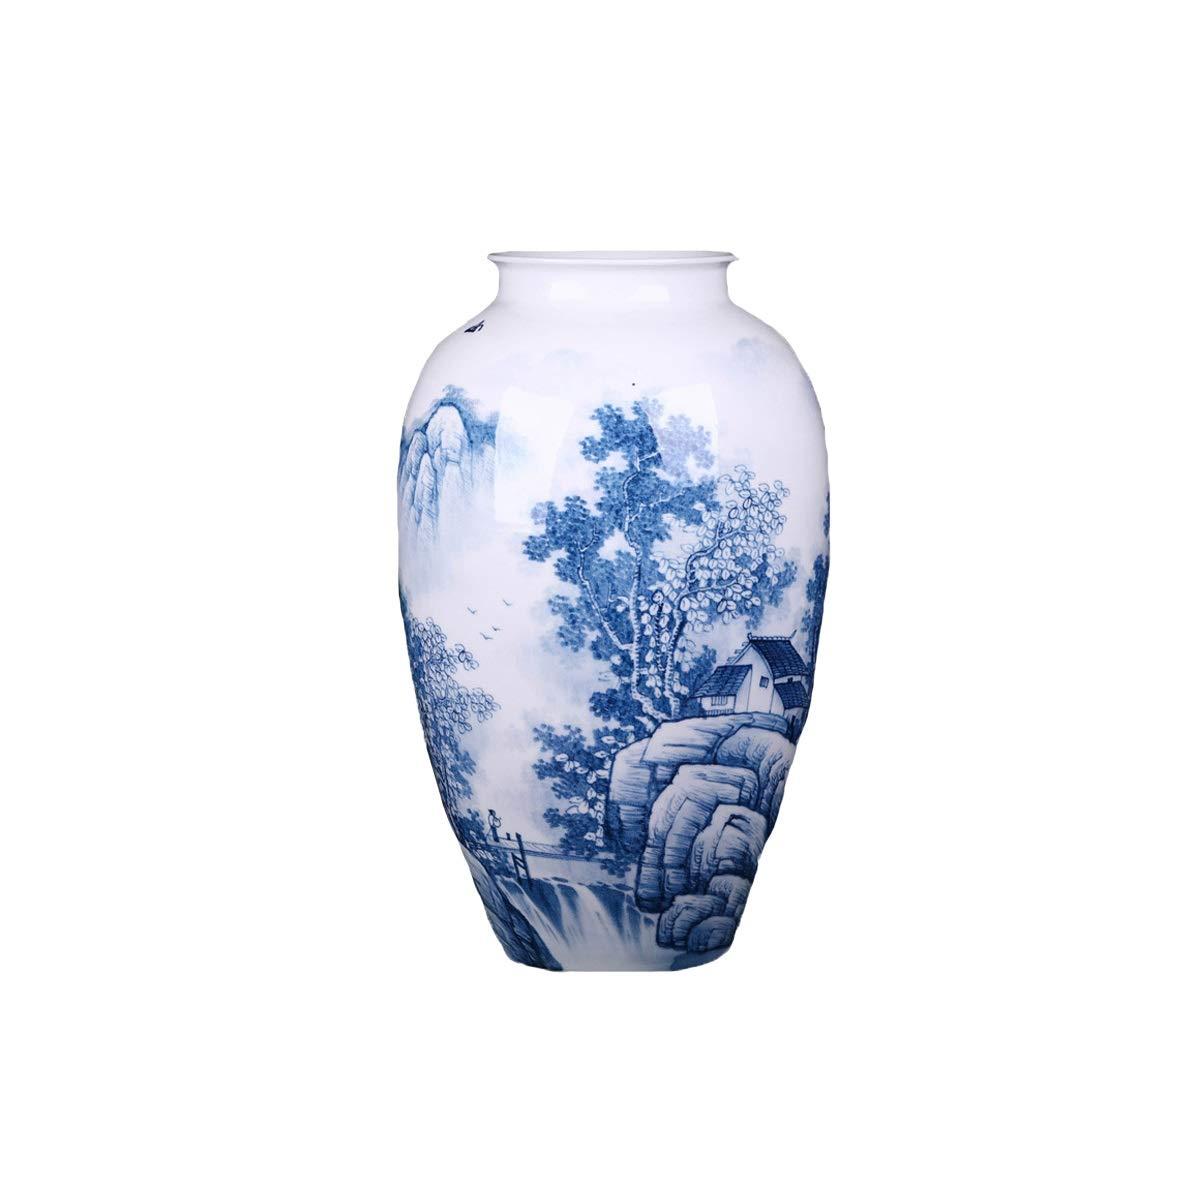 SHENGSHIHUIZHONG 花瓶の飾り、景徳鎮の陶磁器の飾り、山の中の青と白の磁器の花瓶、新しい中国の家庭用居間のフラワーアレンジメントの飾り、ギフト用の飾り、 中華風 (PATTERN : B) B07SWY1CPV  B